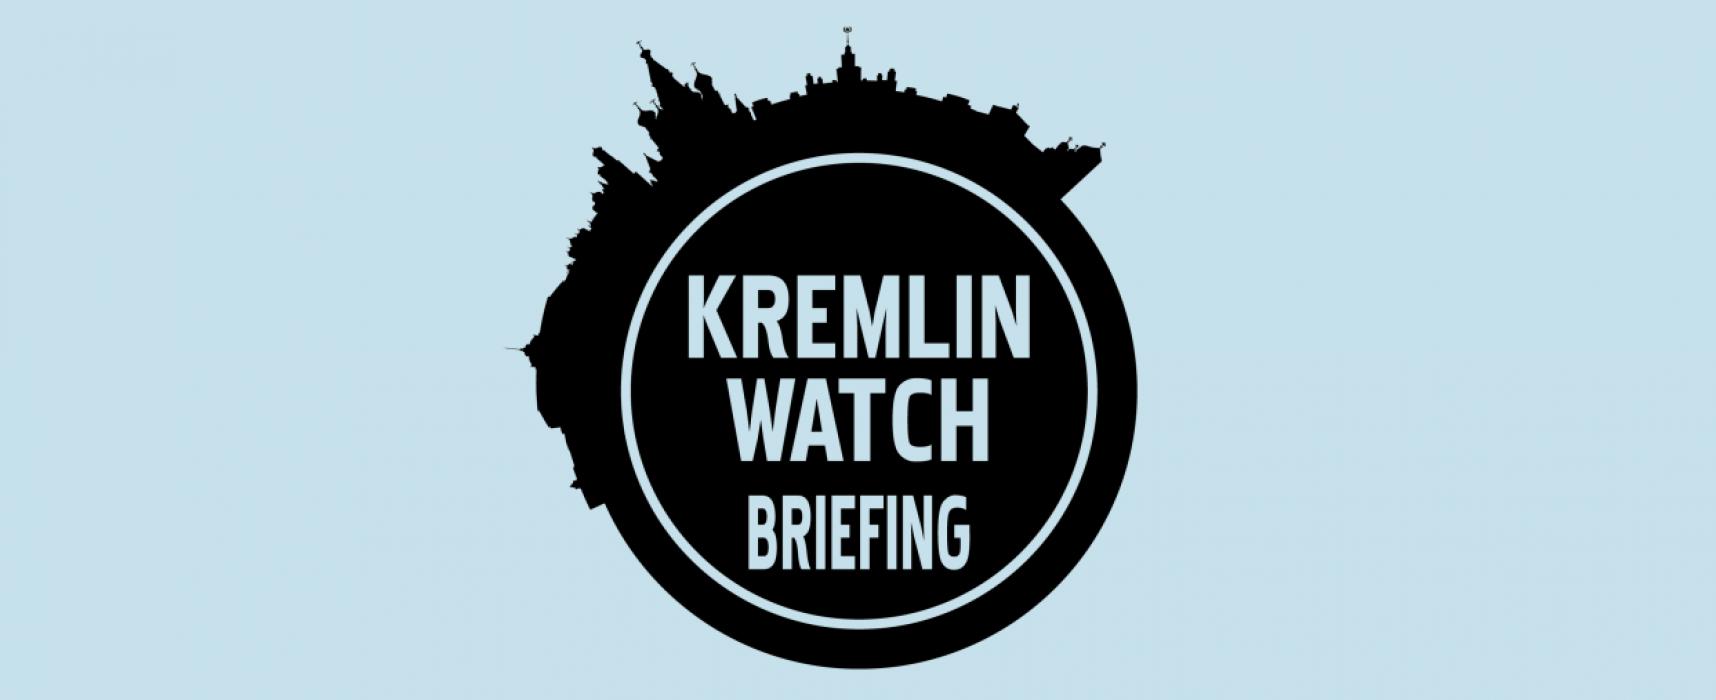 Kremlin Watch Briefing: The Kremlin sanctions 322 Ukrainian citizens and plans a Russian ground station in Cuba